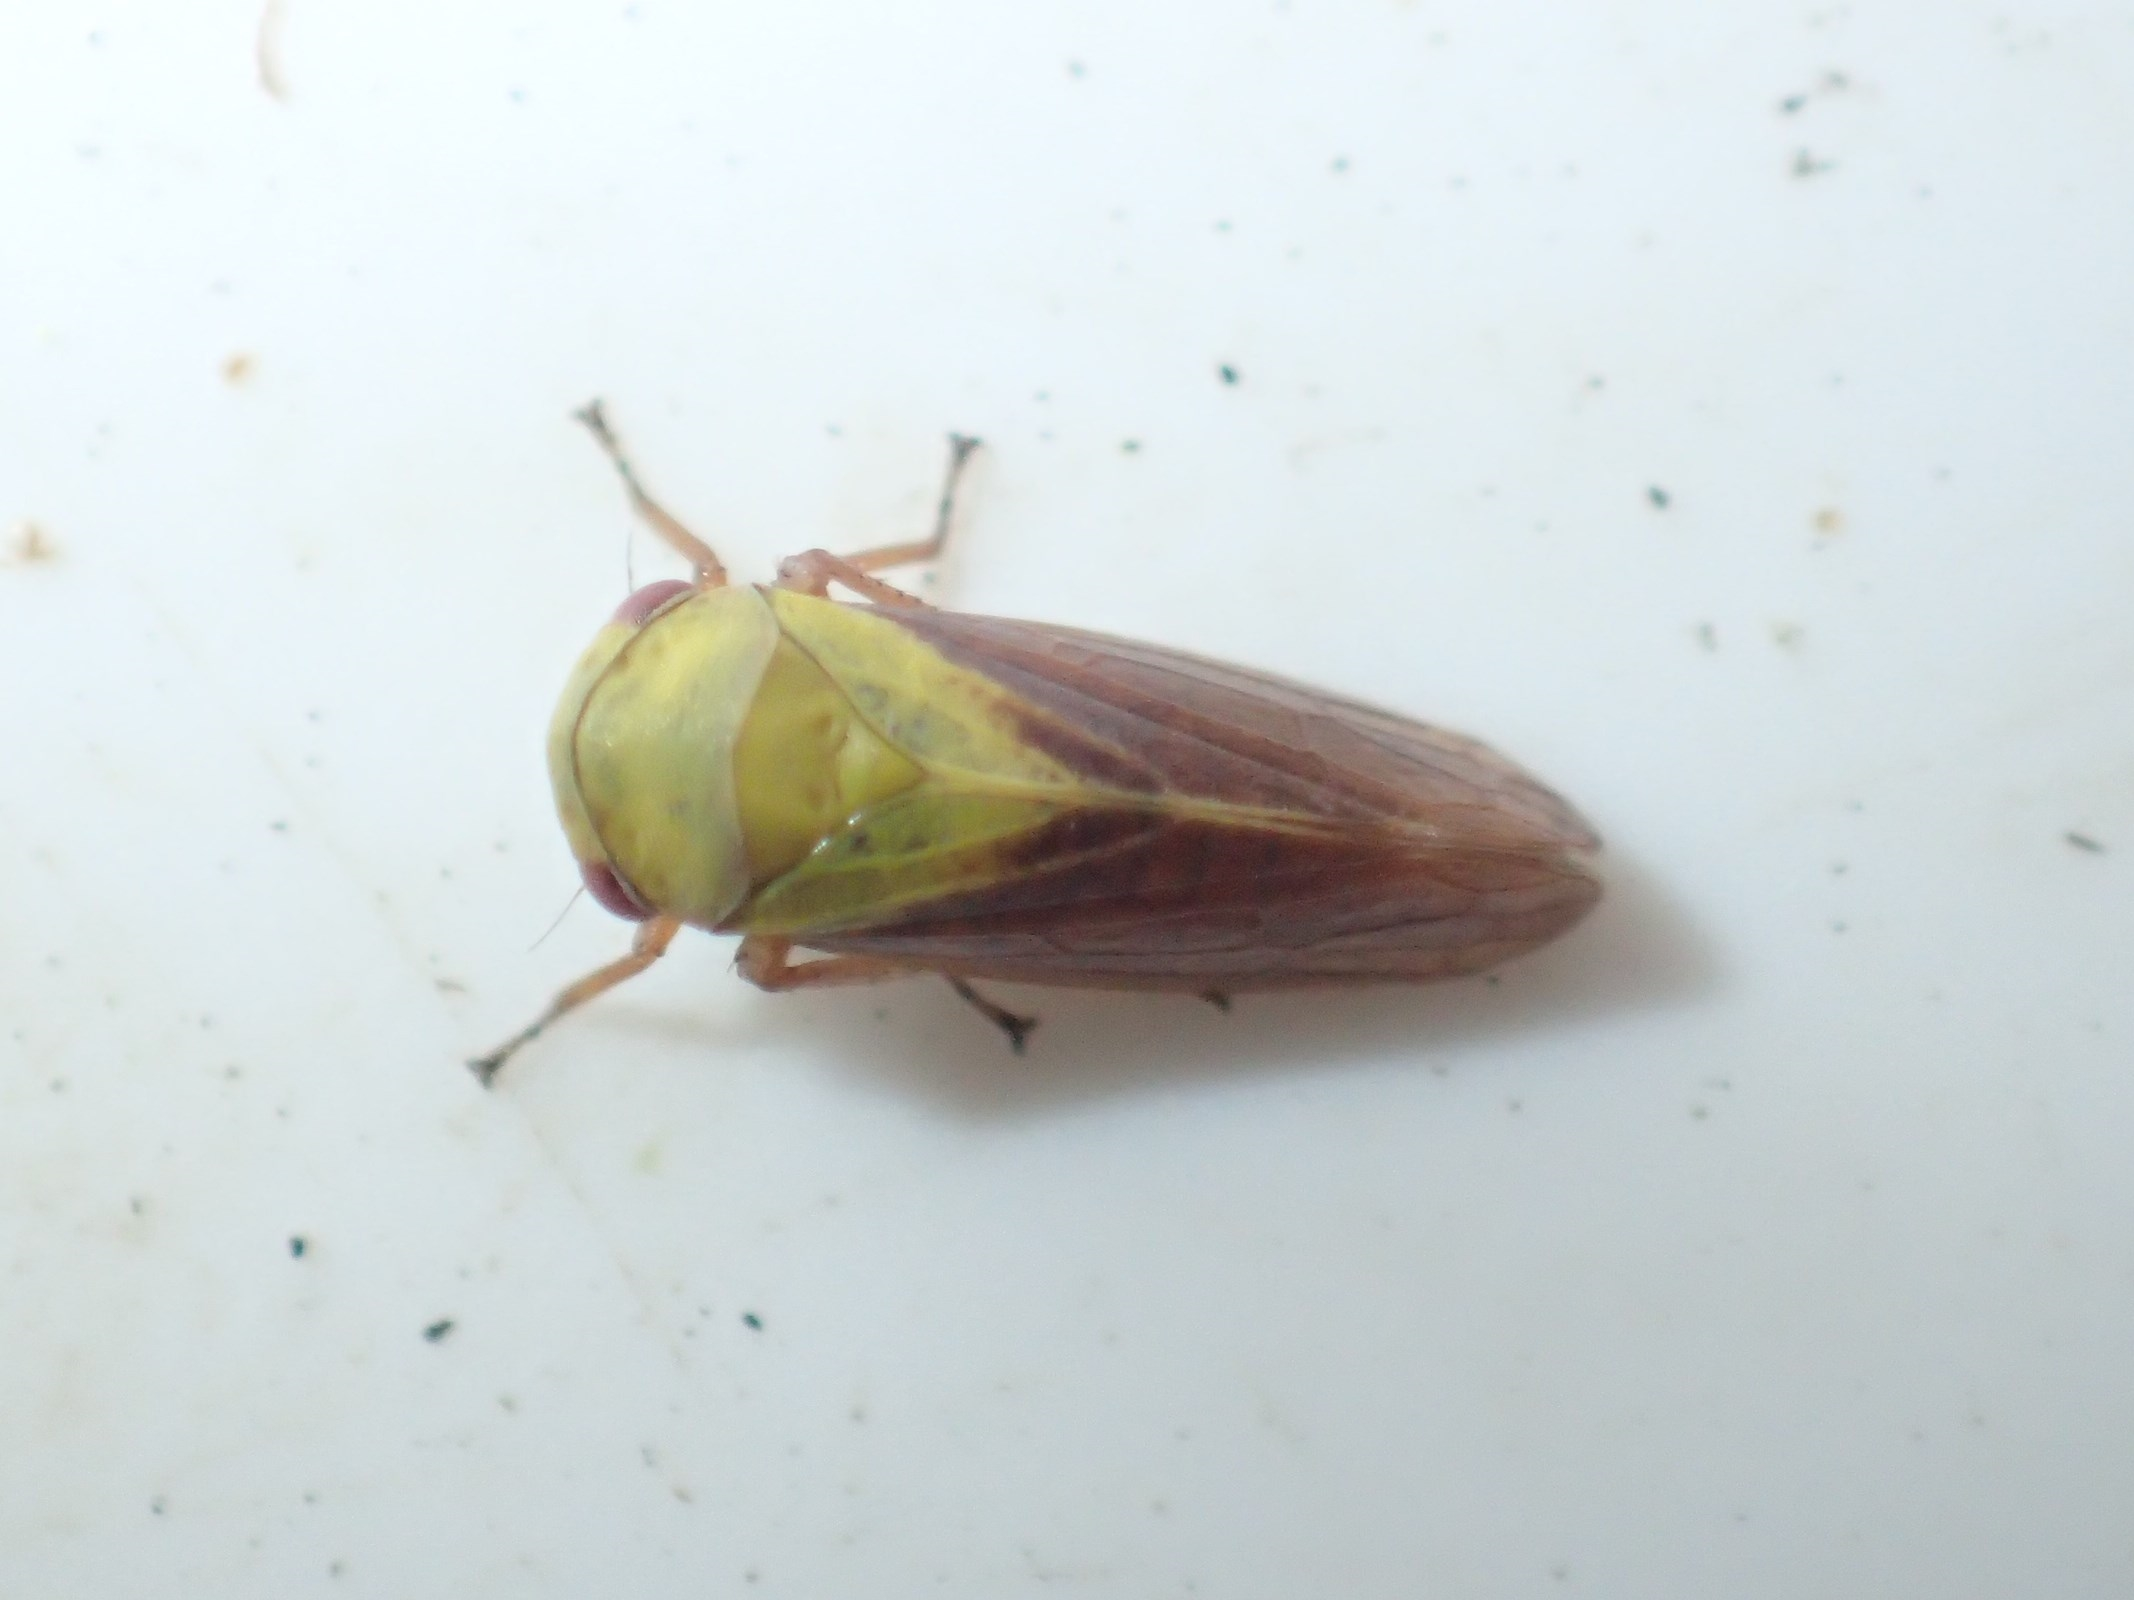 Birkecikade (Oncopsis flavicollis)